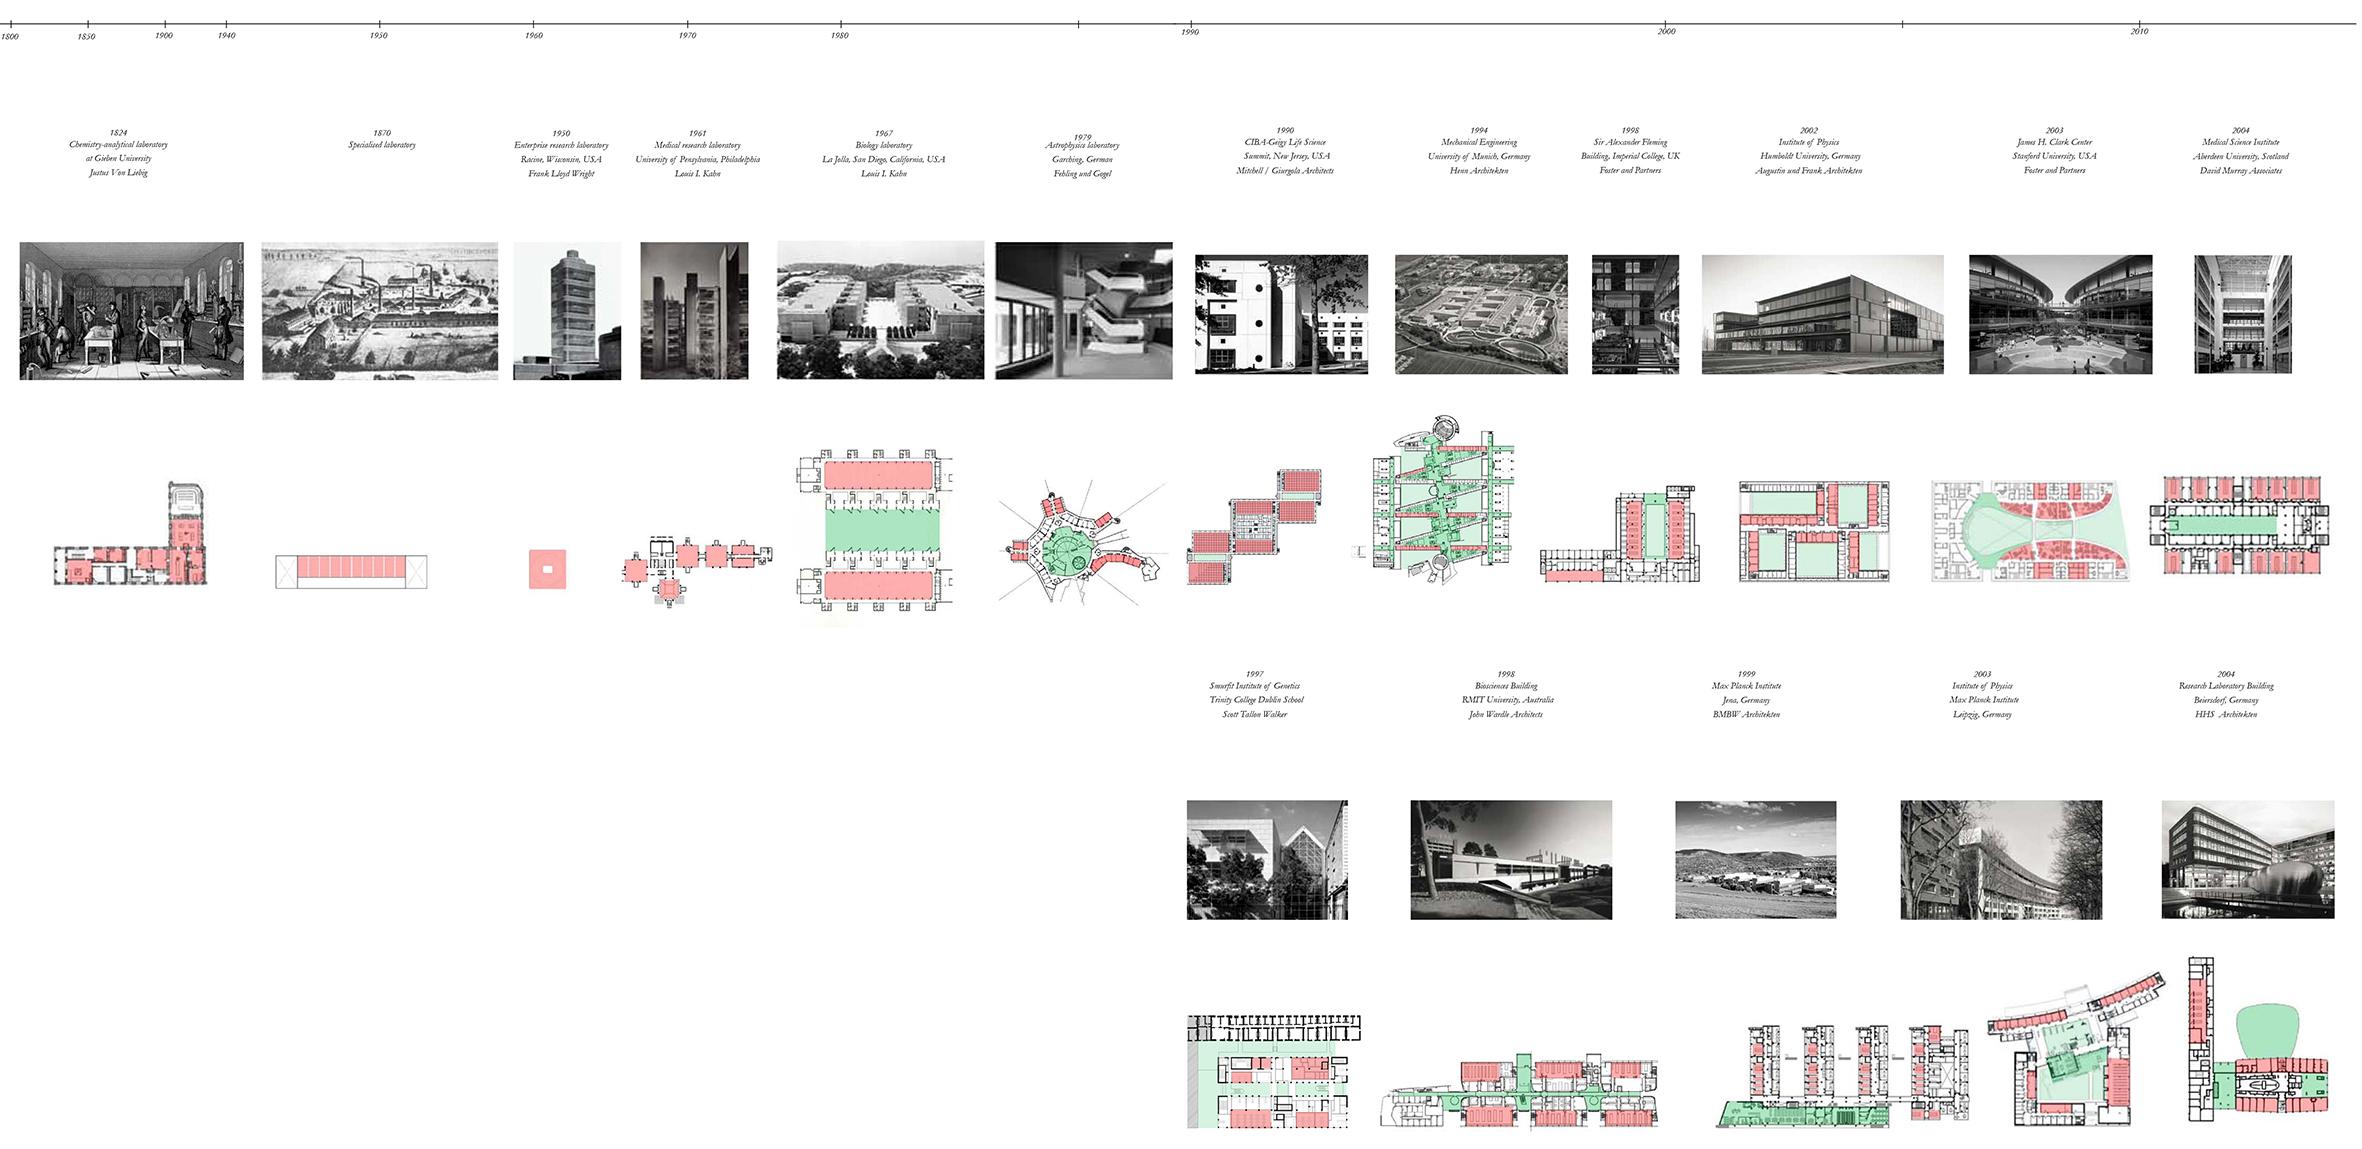 History of Laboratories